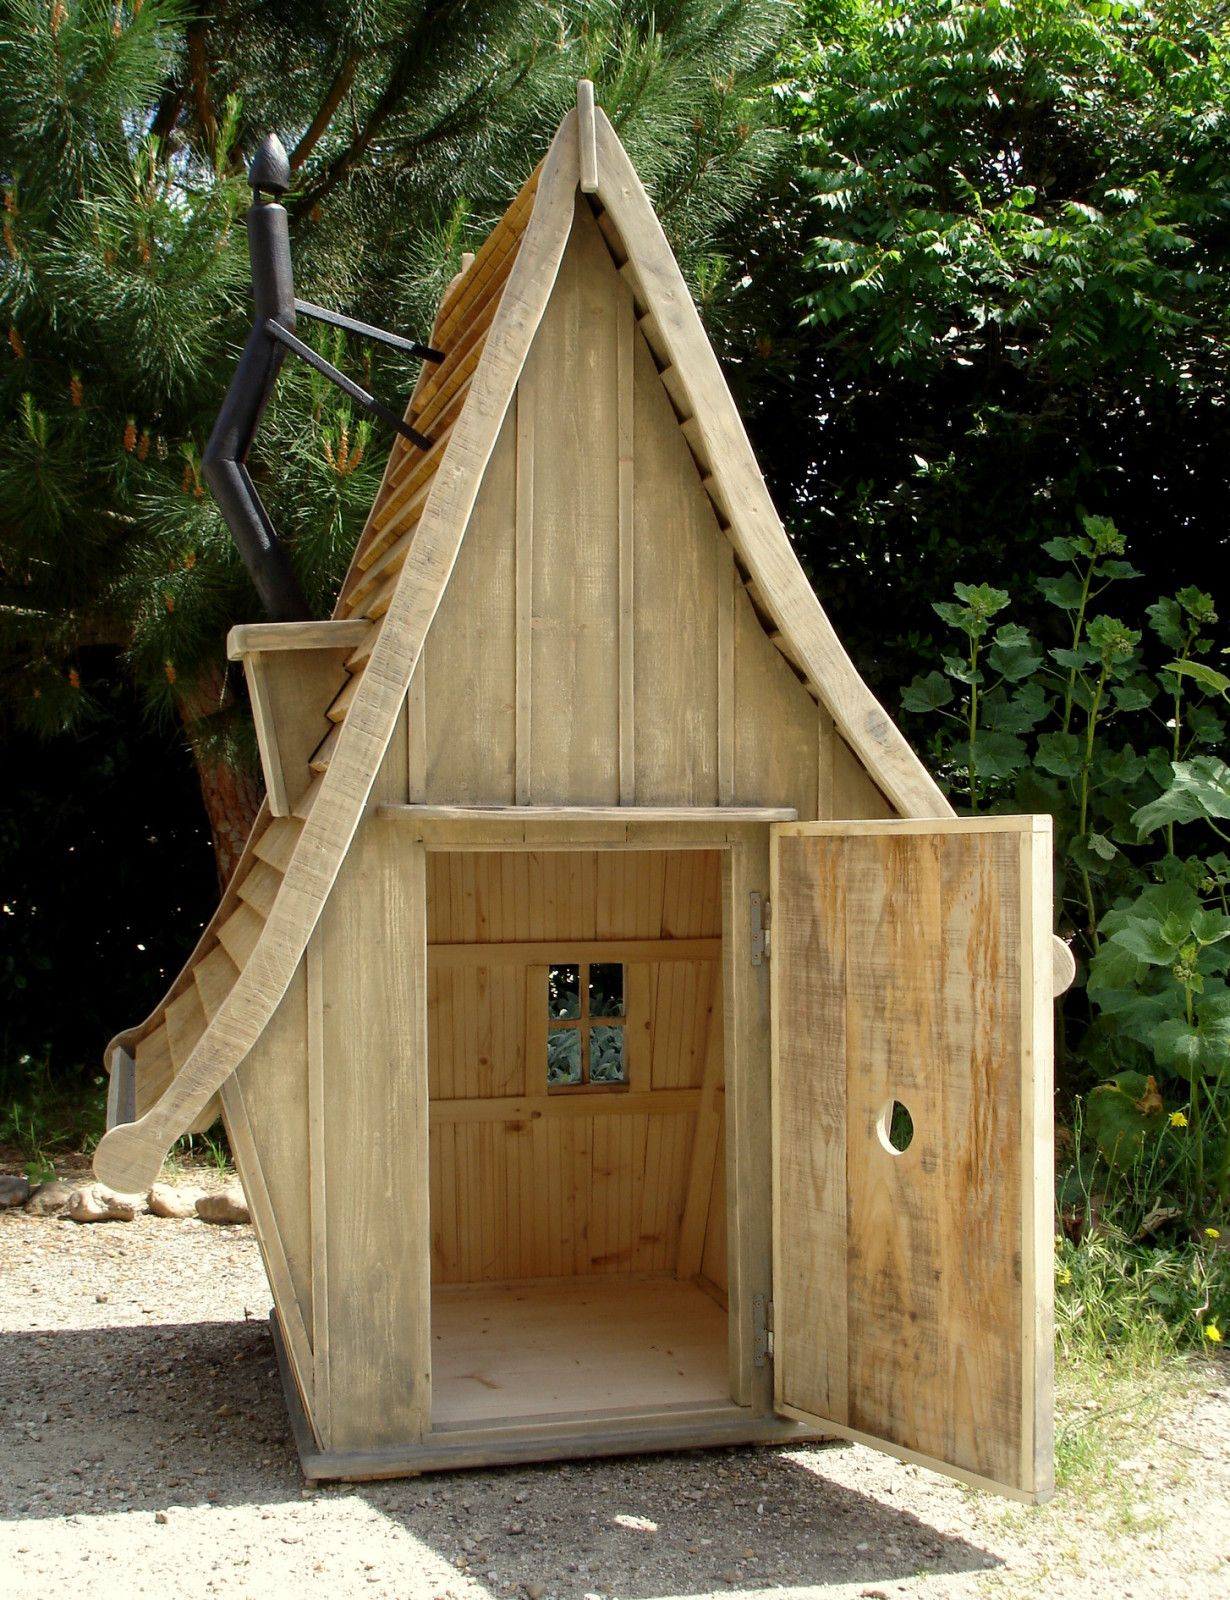 la cabane d 39 alice cabanes cabane bois et cabane pour enfant. Black Bedroom Furniture Sets. Home Design Ideas